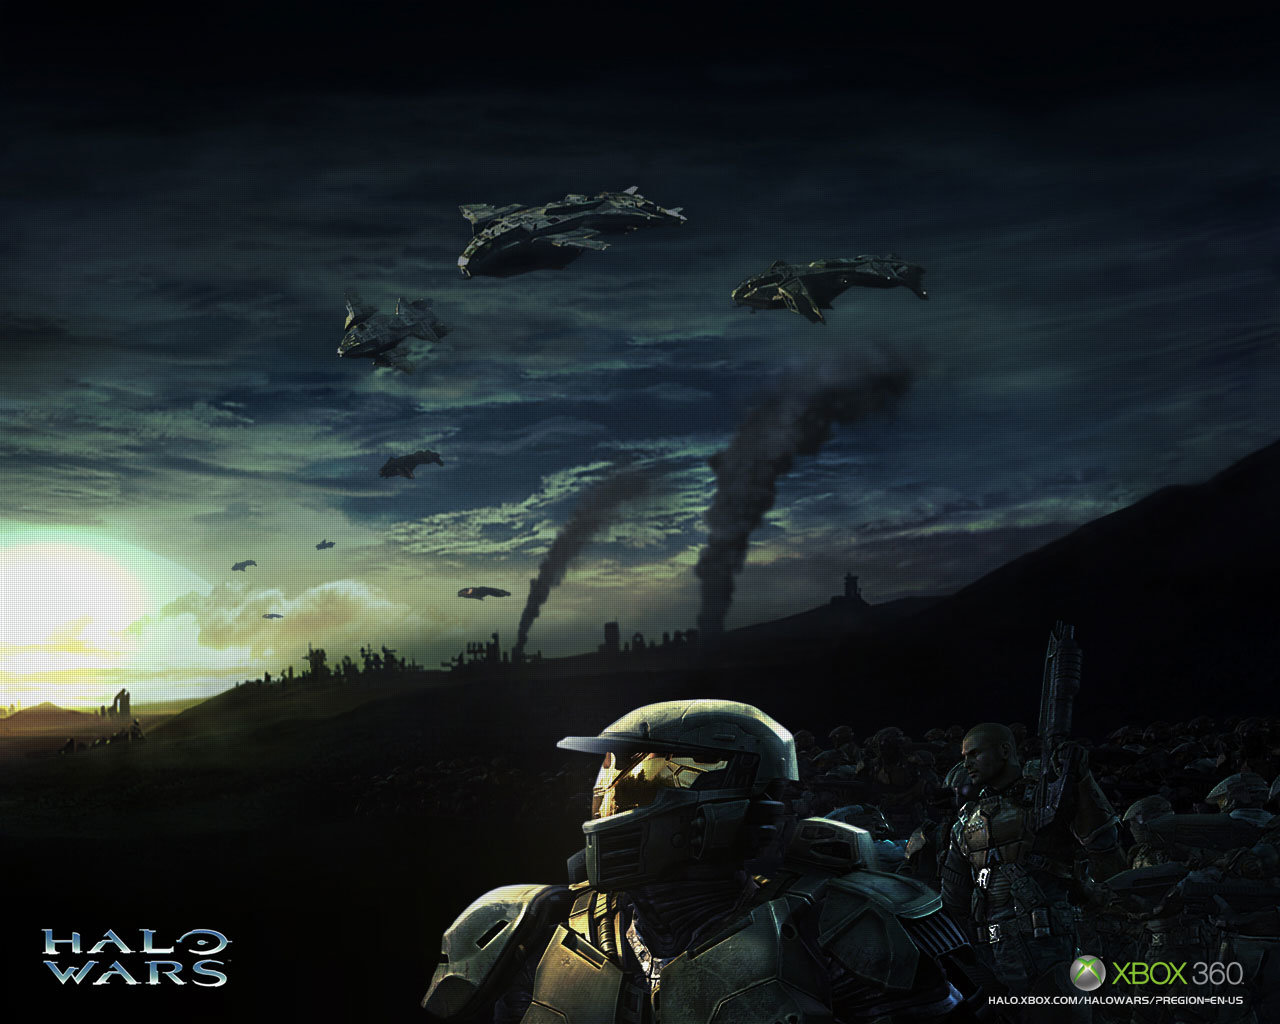 halo wars wallpapers hd for desktop backgrounds